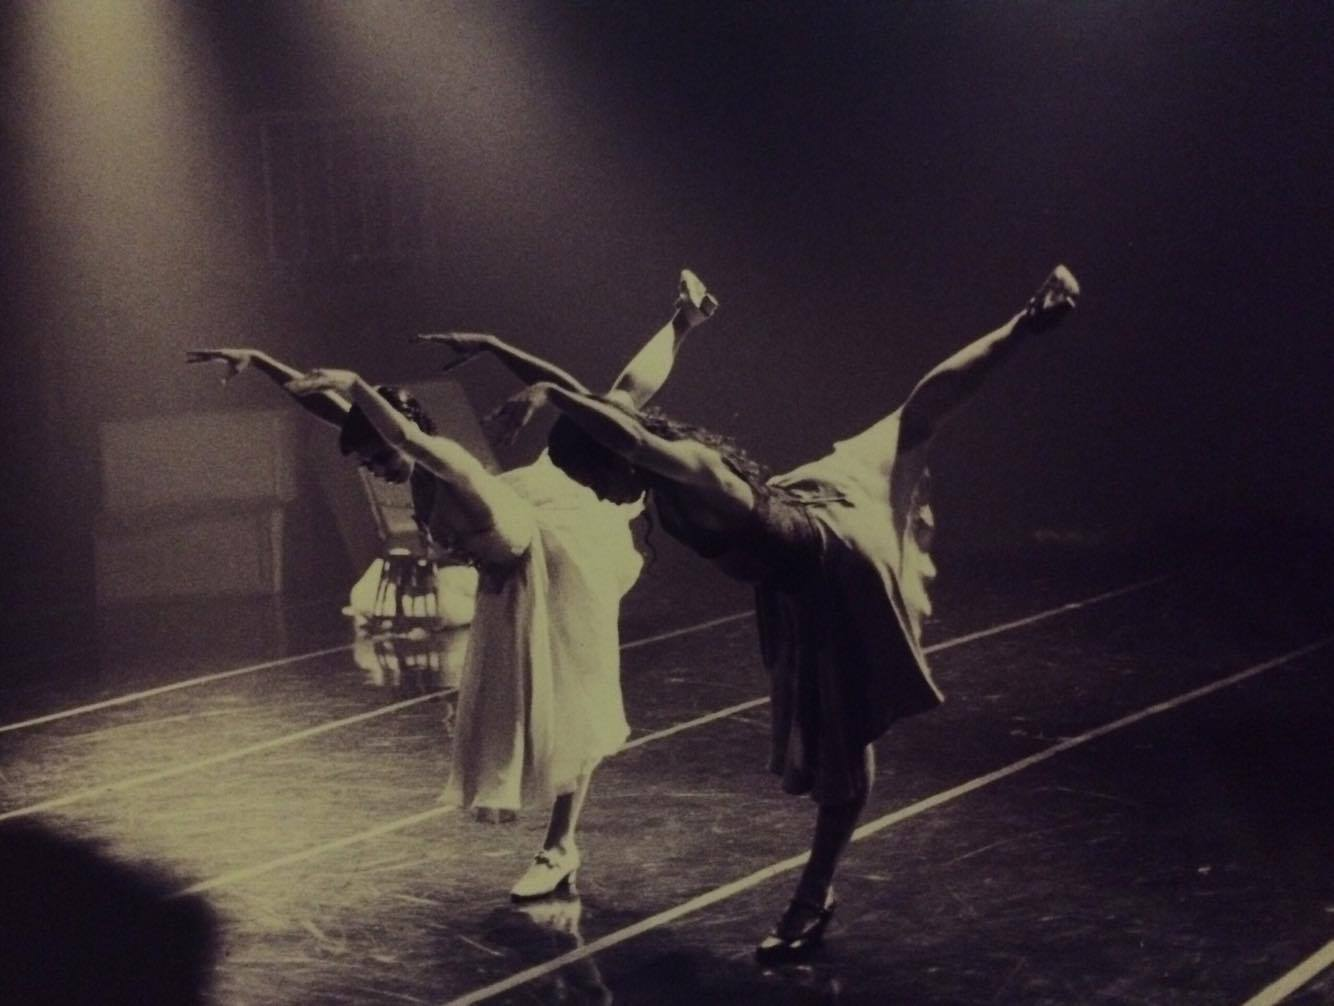 ópera do malandro - 1994 -Coreografia Giselle Tápias